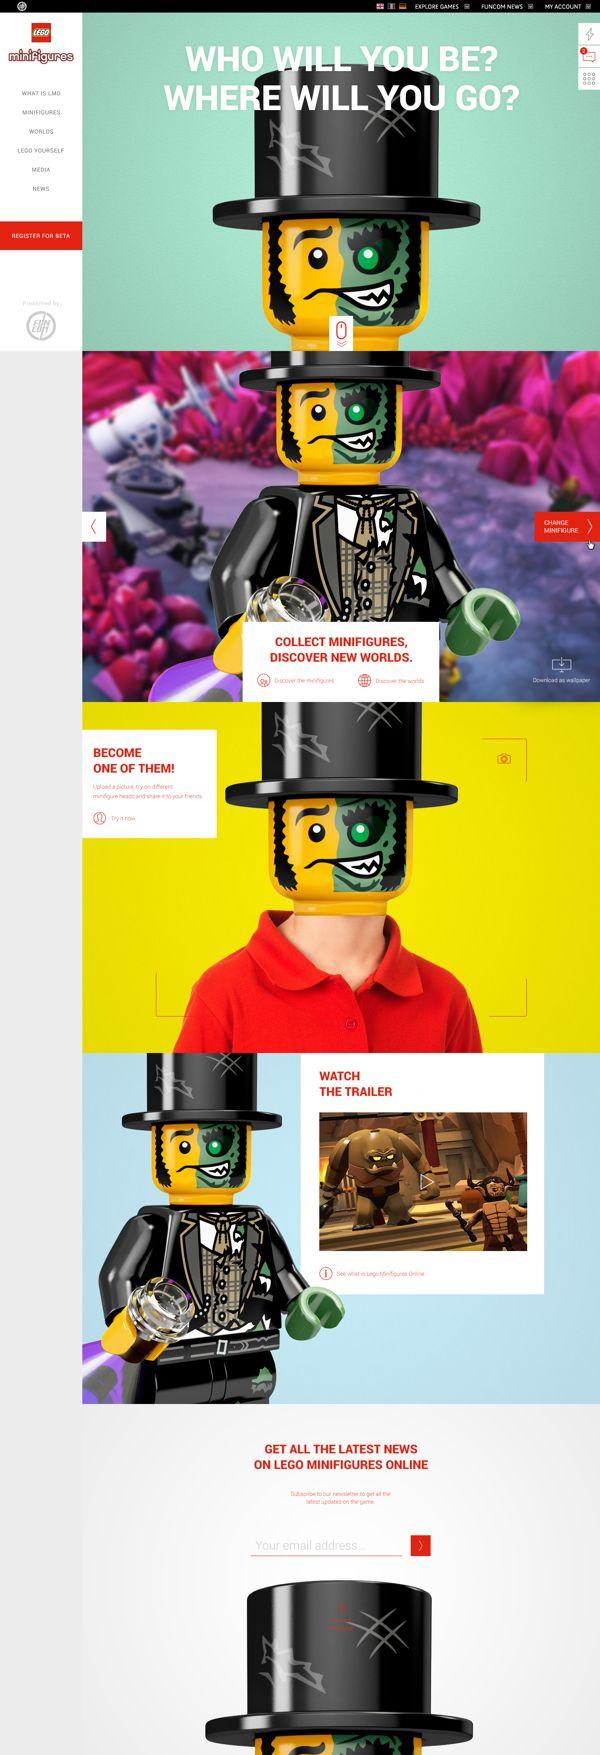 LEGO Minifigures. Get your Lego online. #webdesign #lego #design